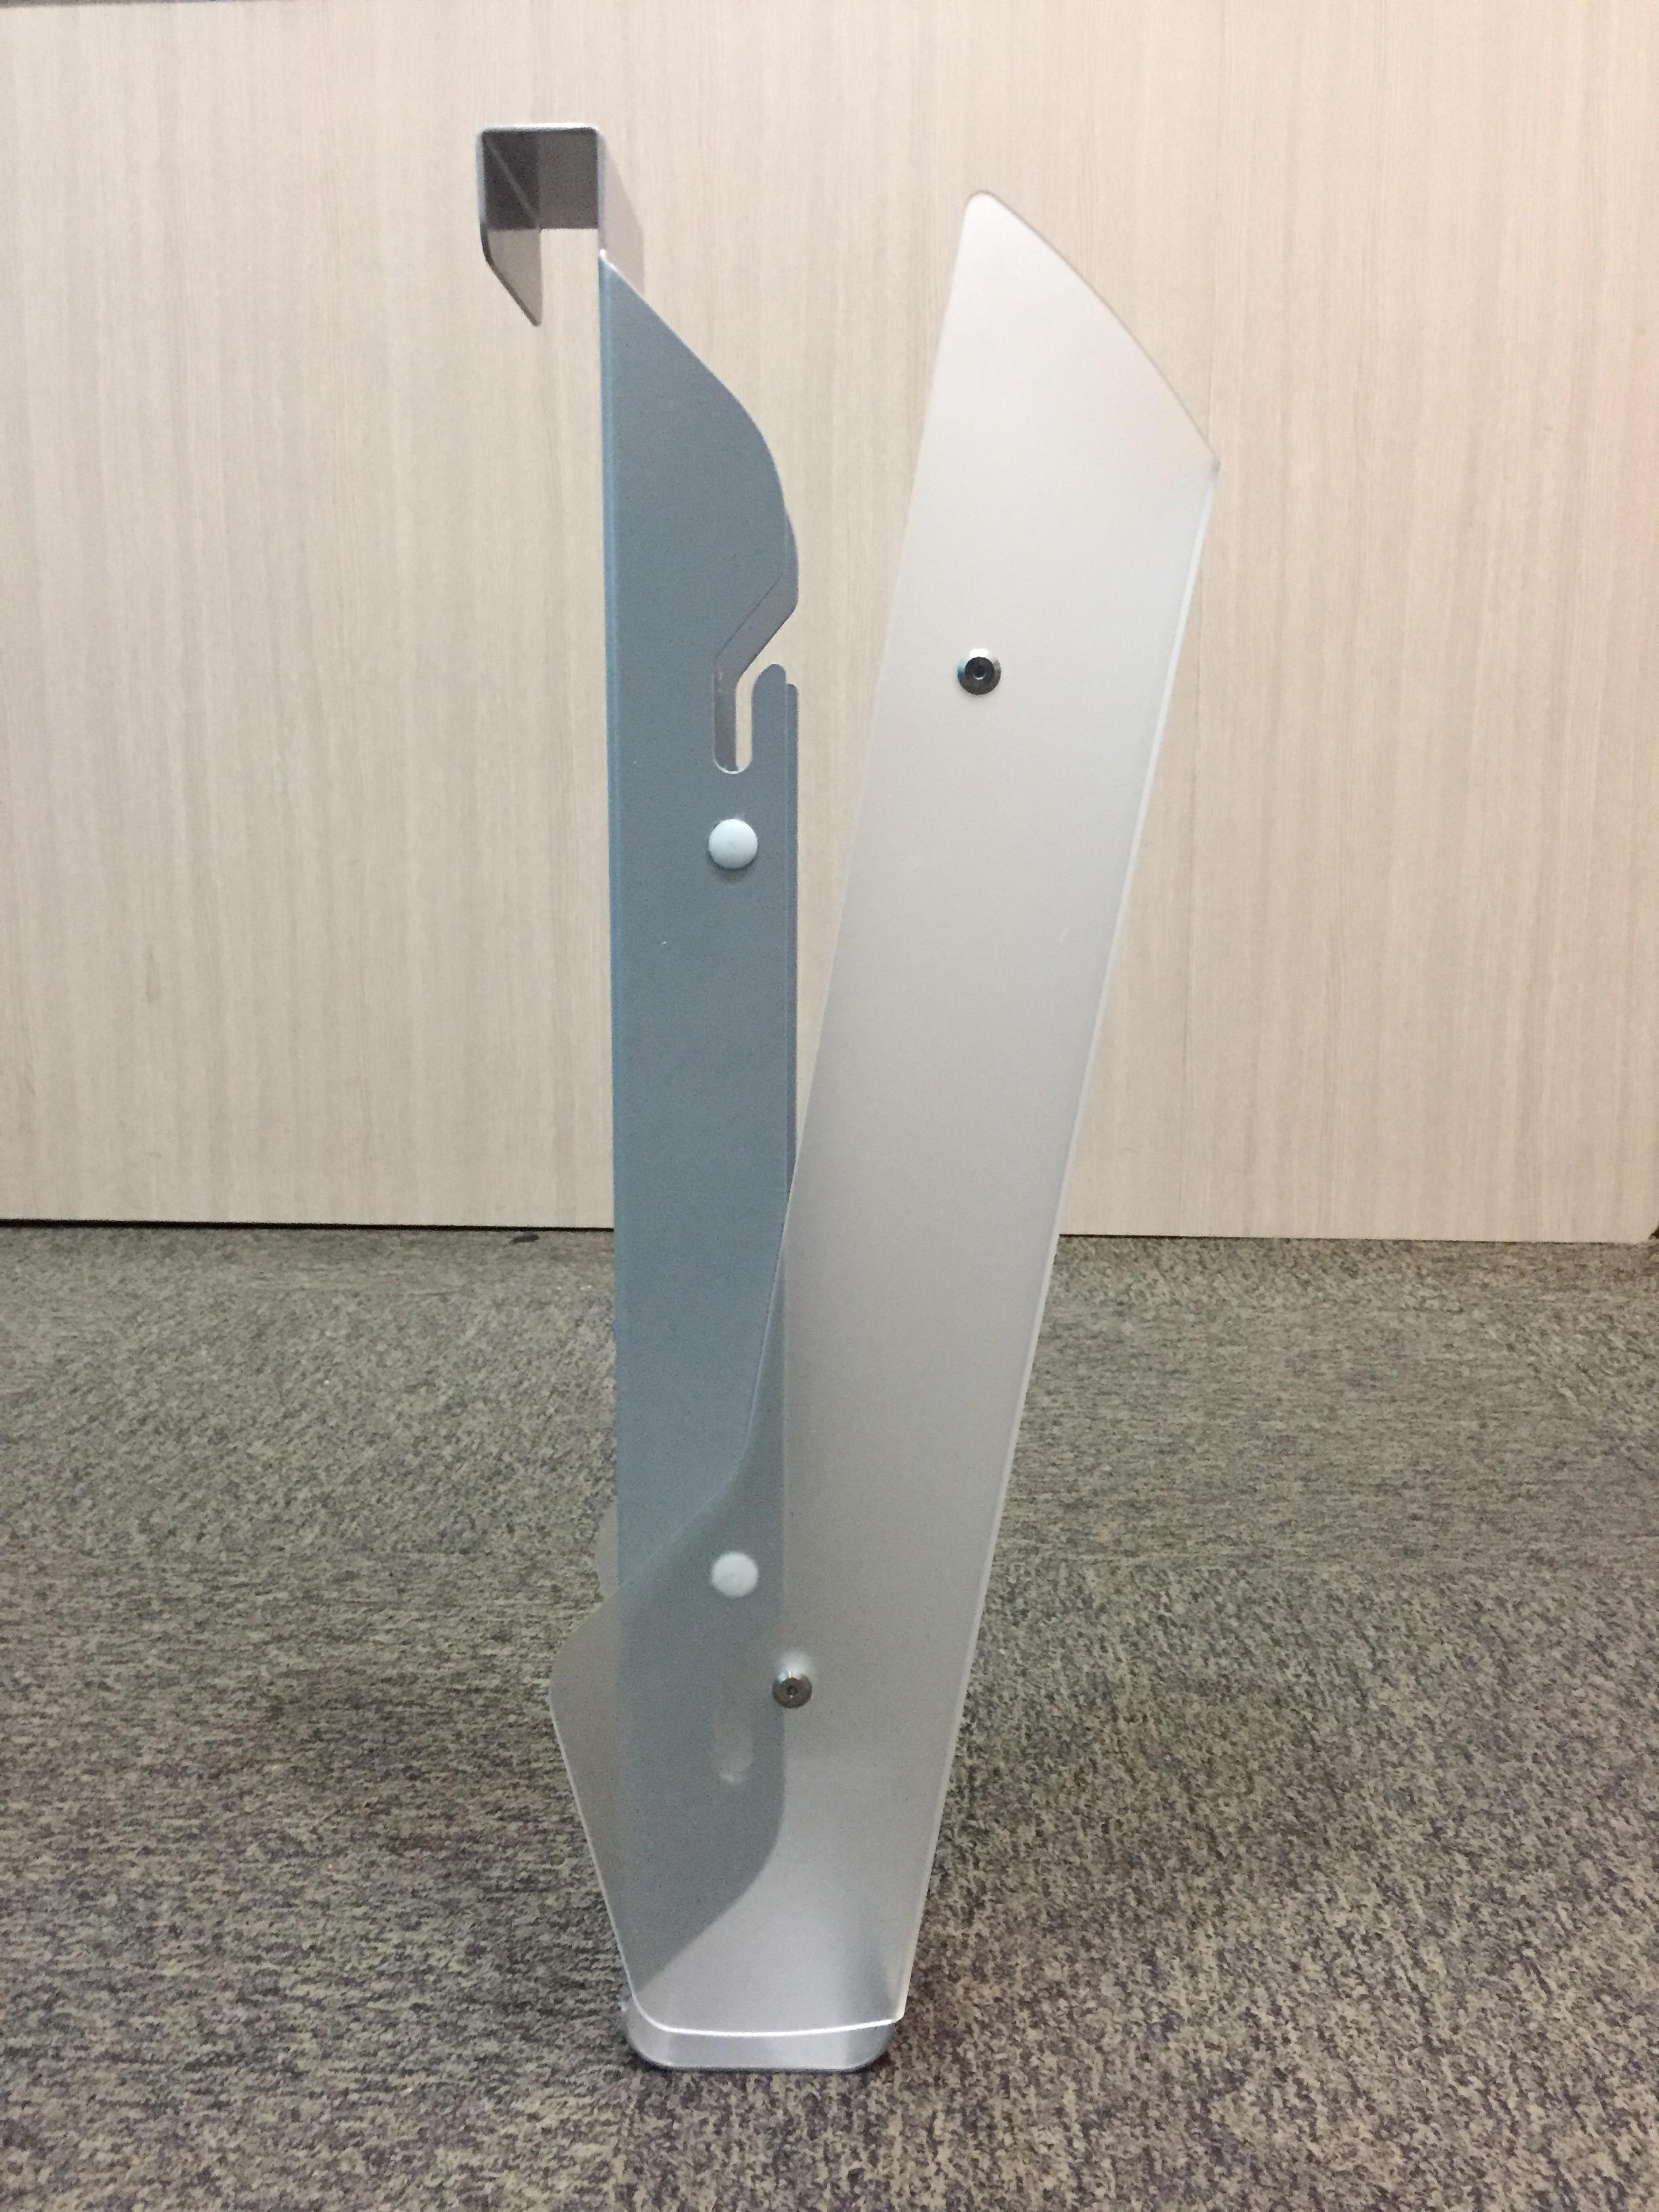 Wall Dispenser WD-02